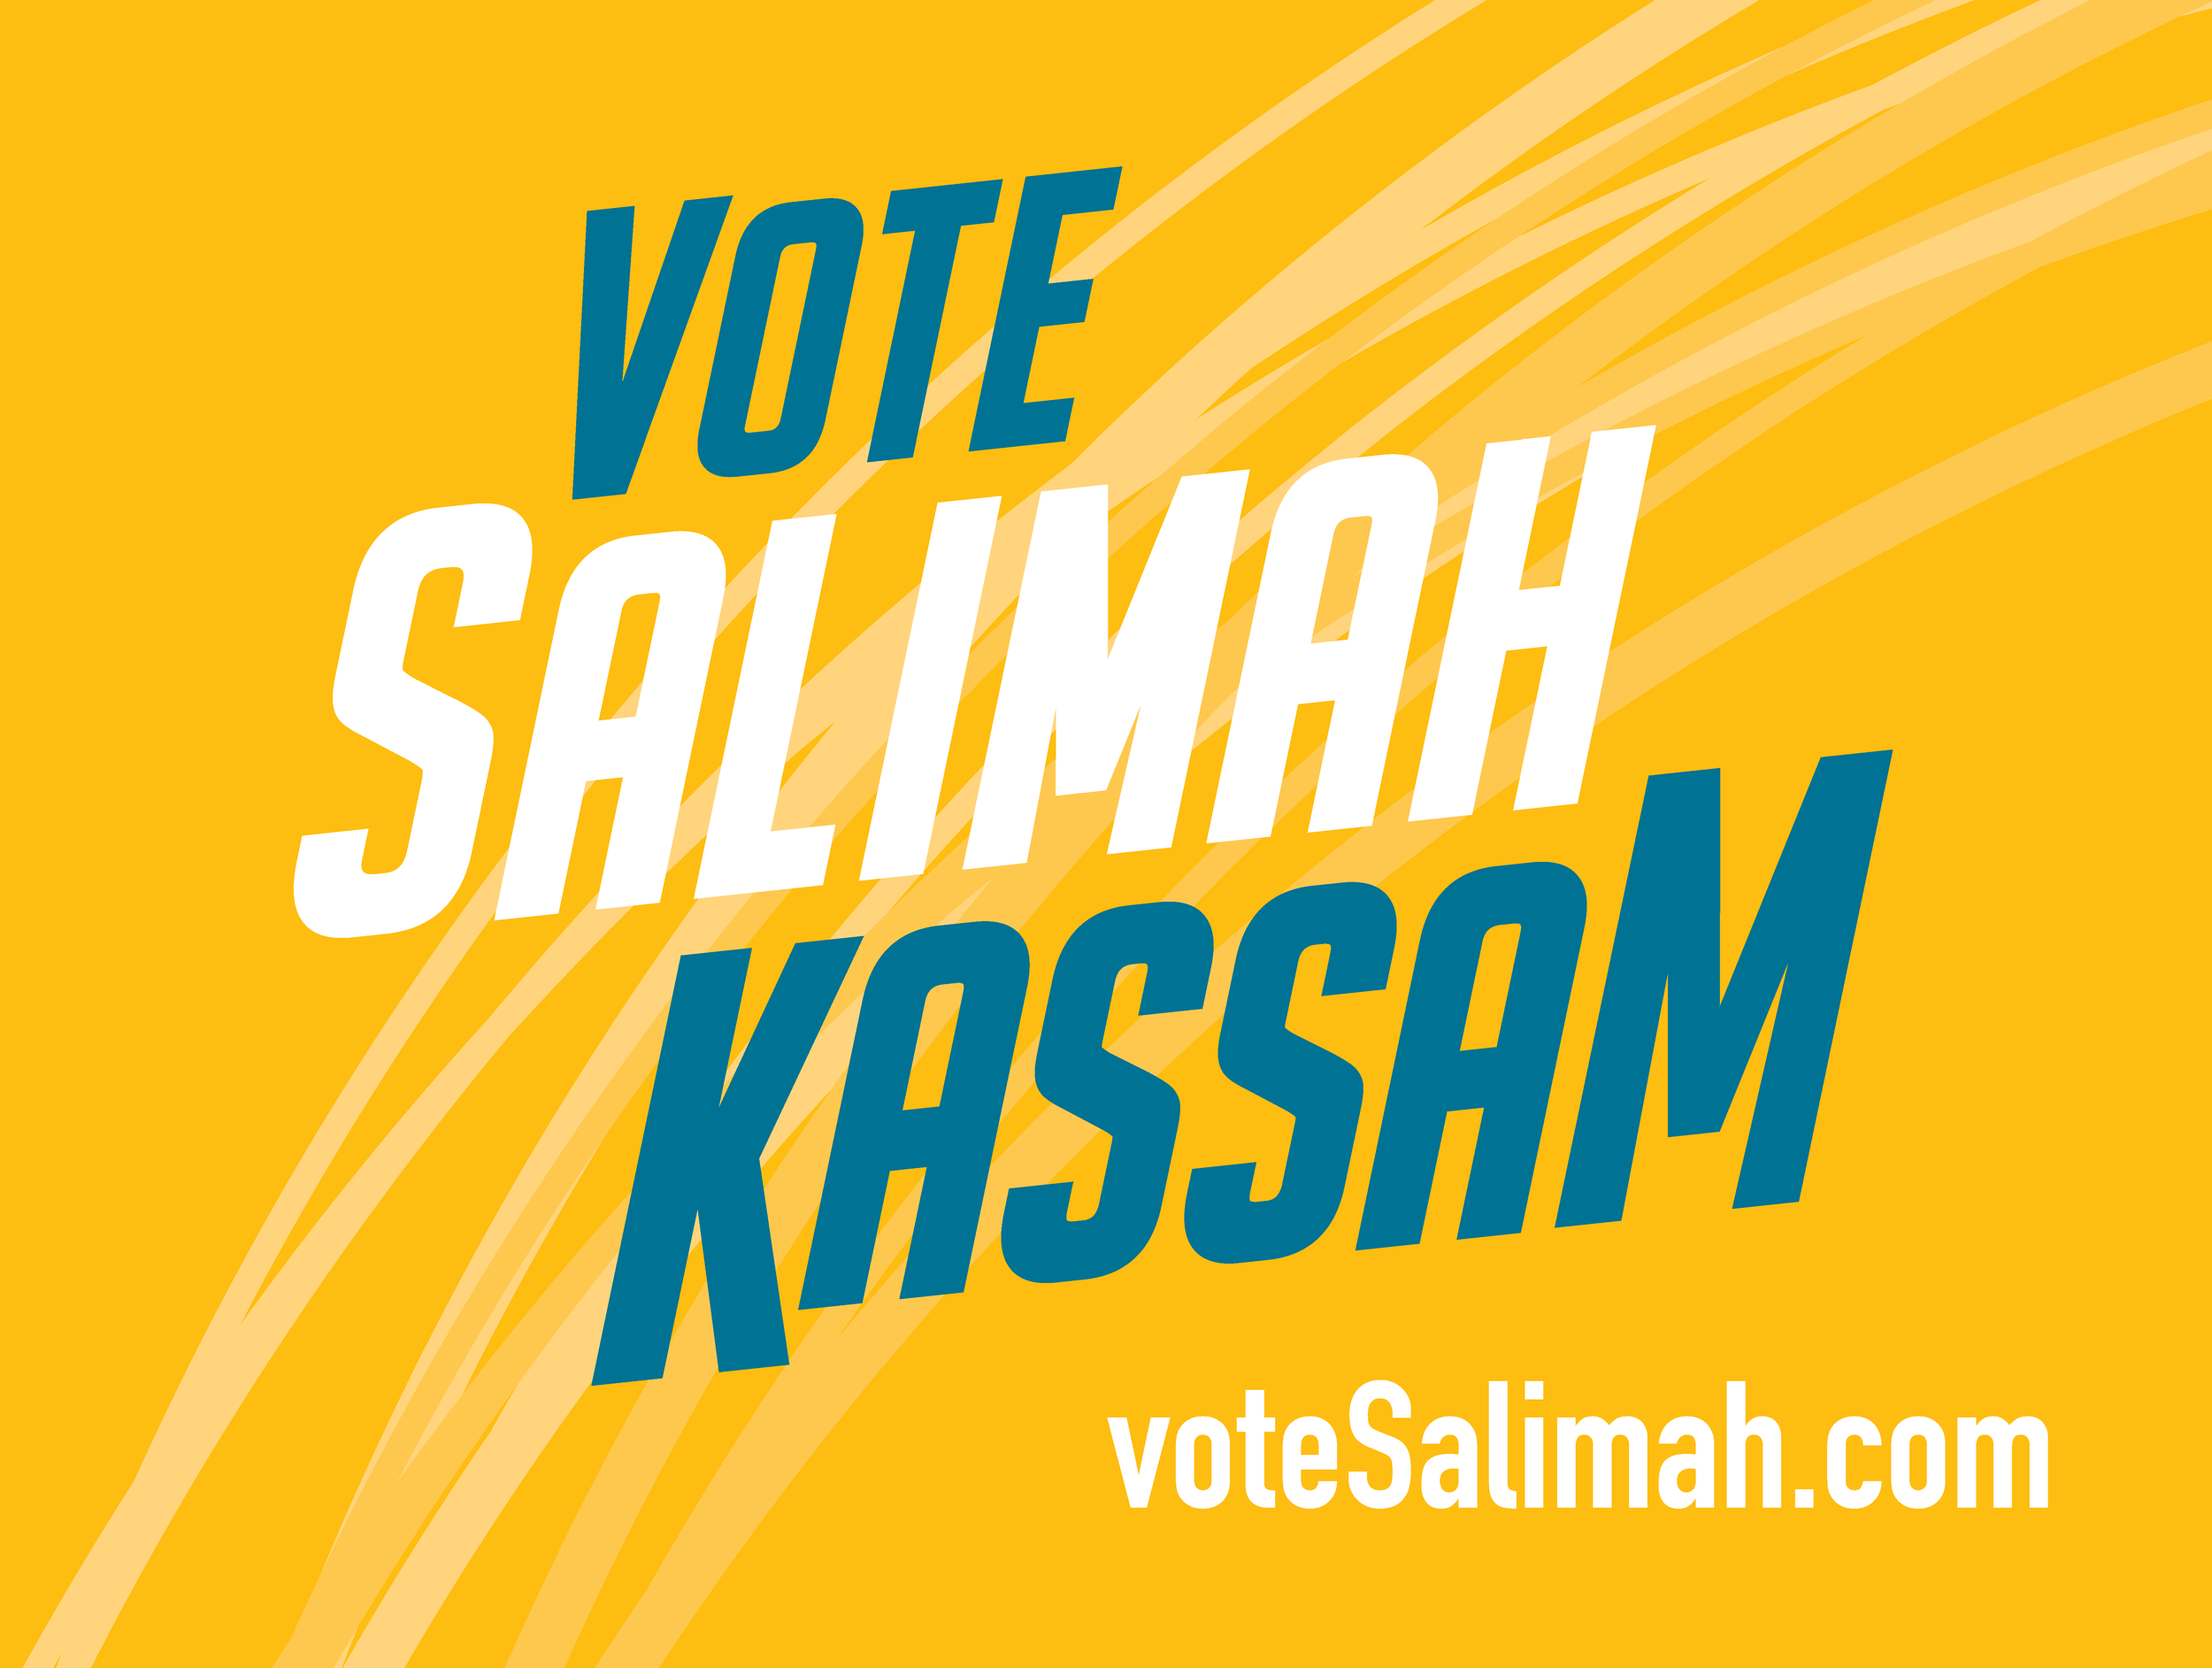 Salimah Kassam